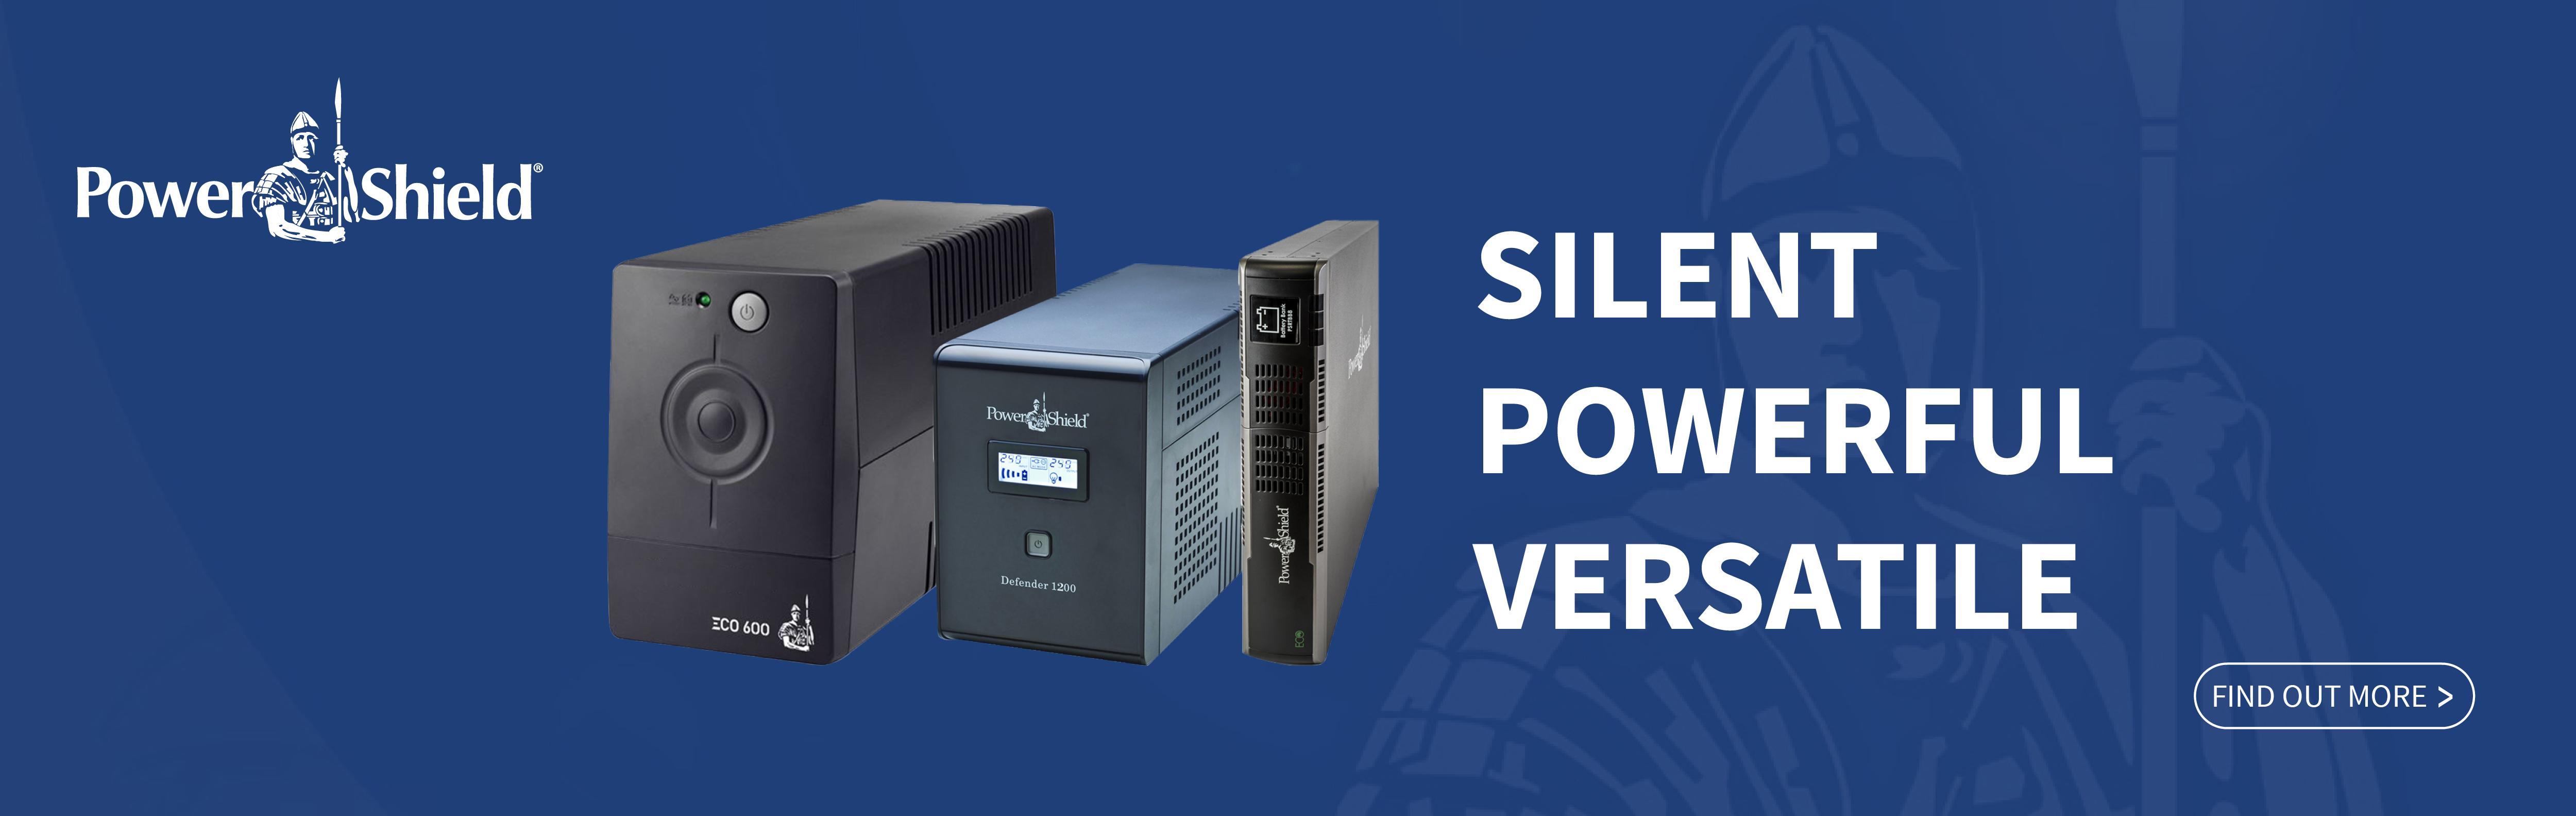 Introducing Powershield